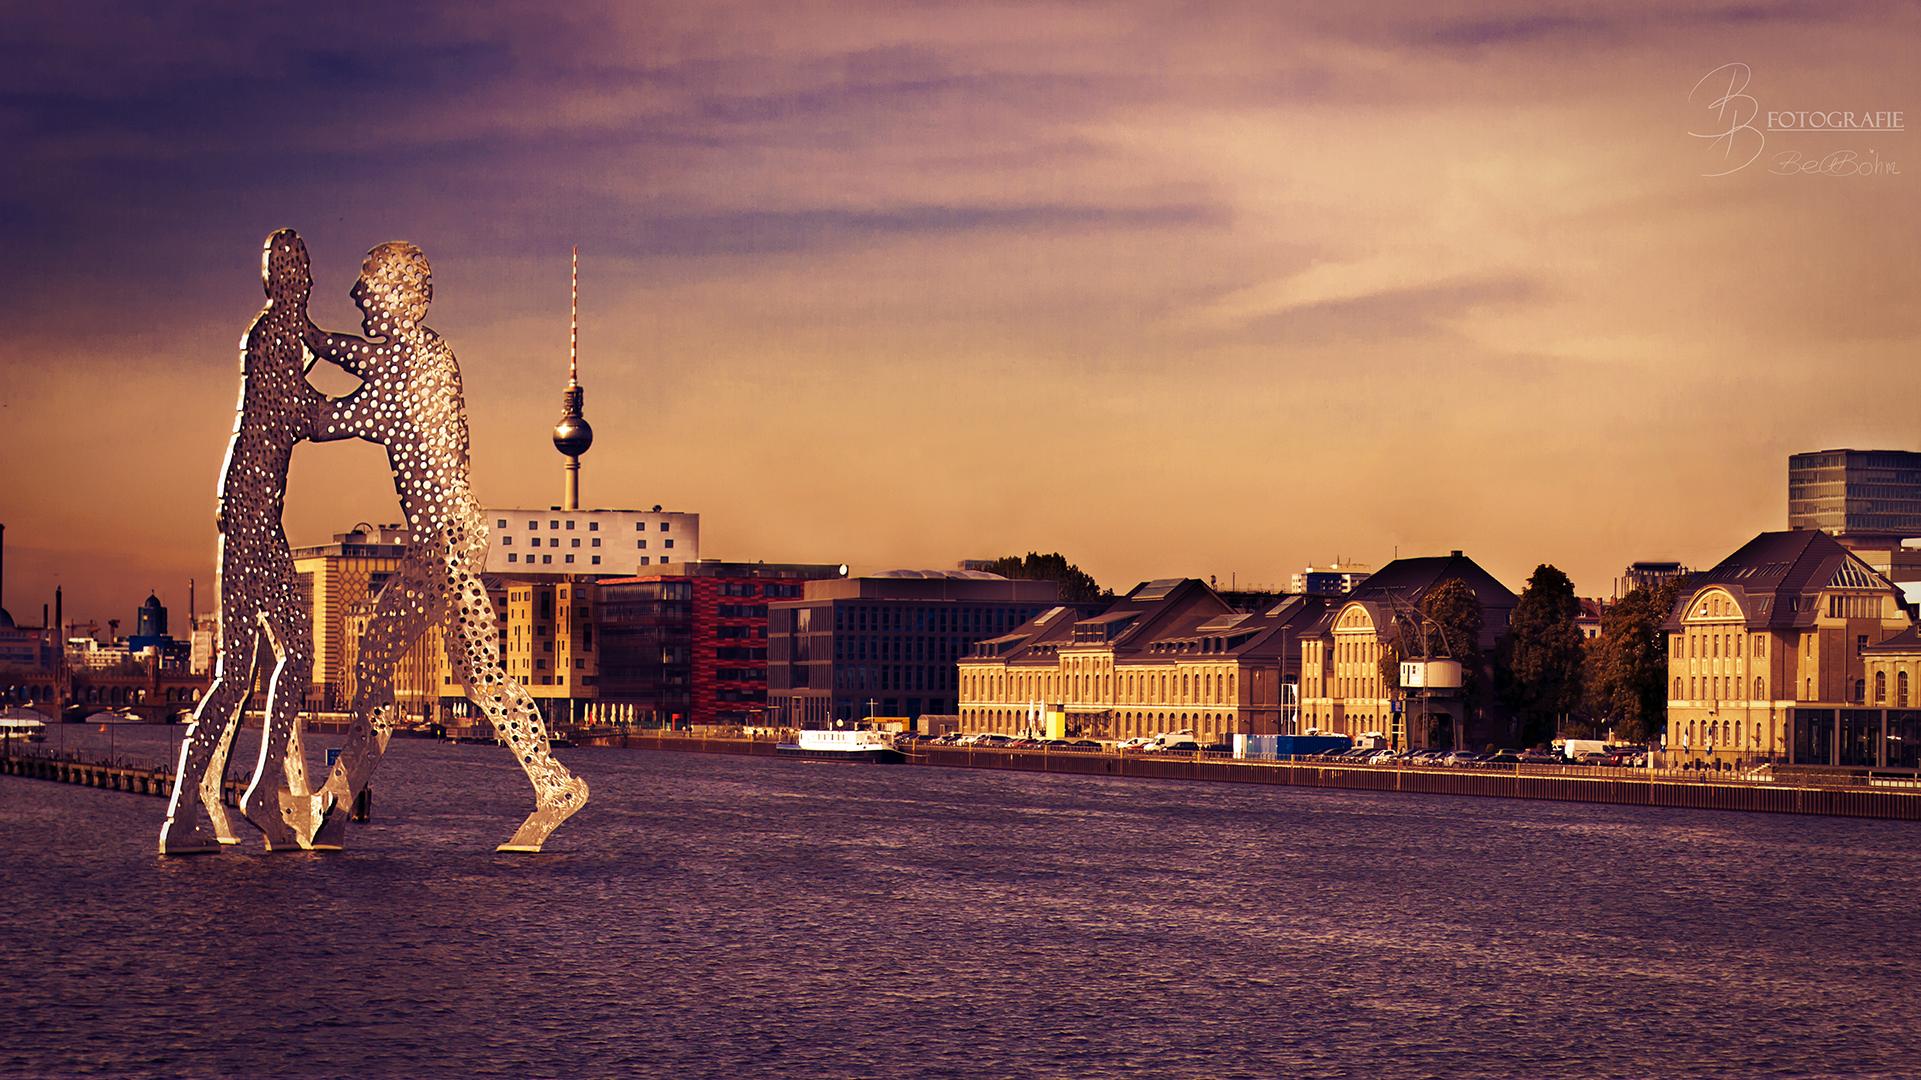 13 Molekülmänner und Osthafen Berlin